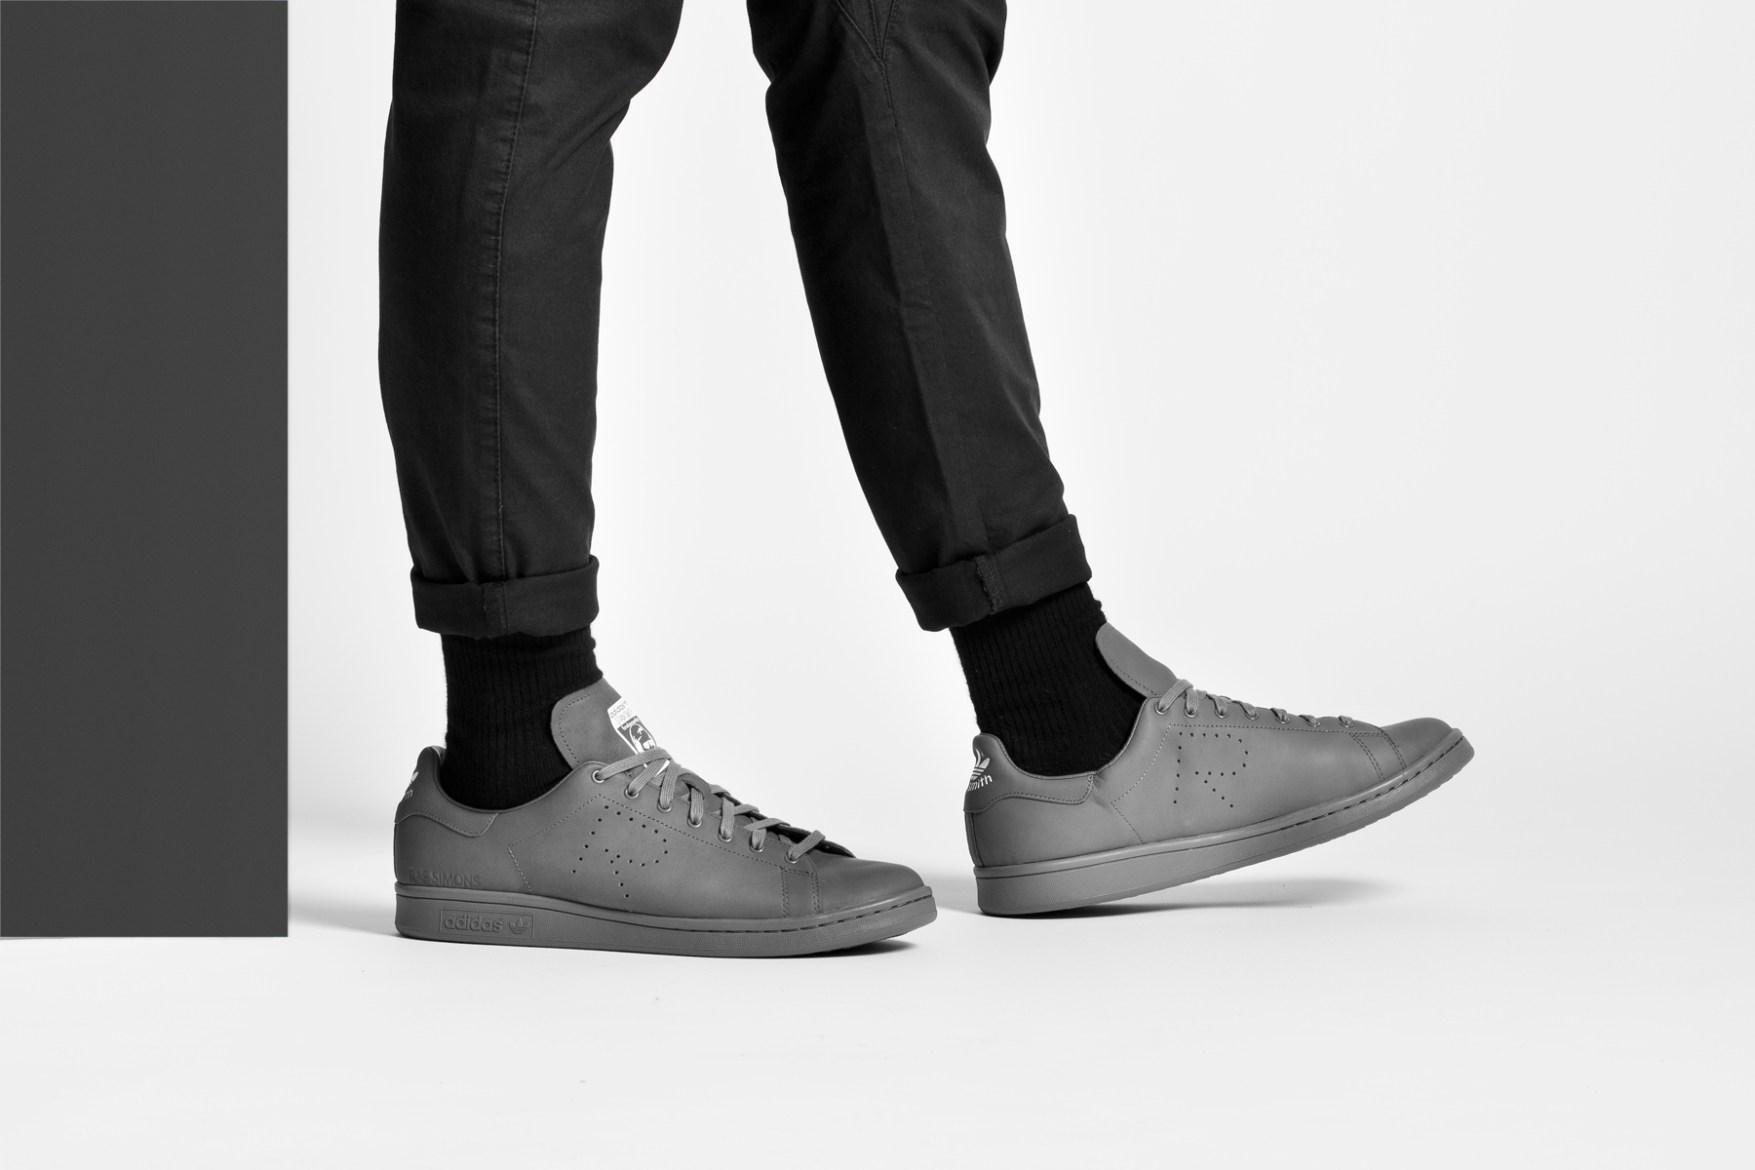 Adidas Stan Smith Raf Simons